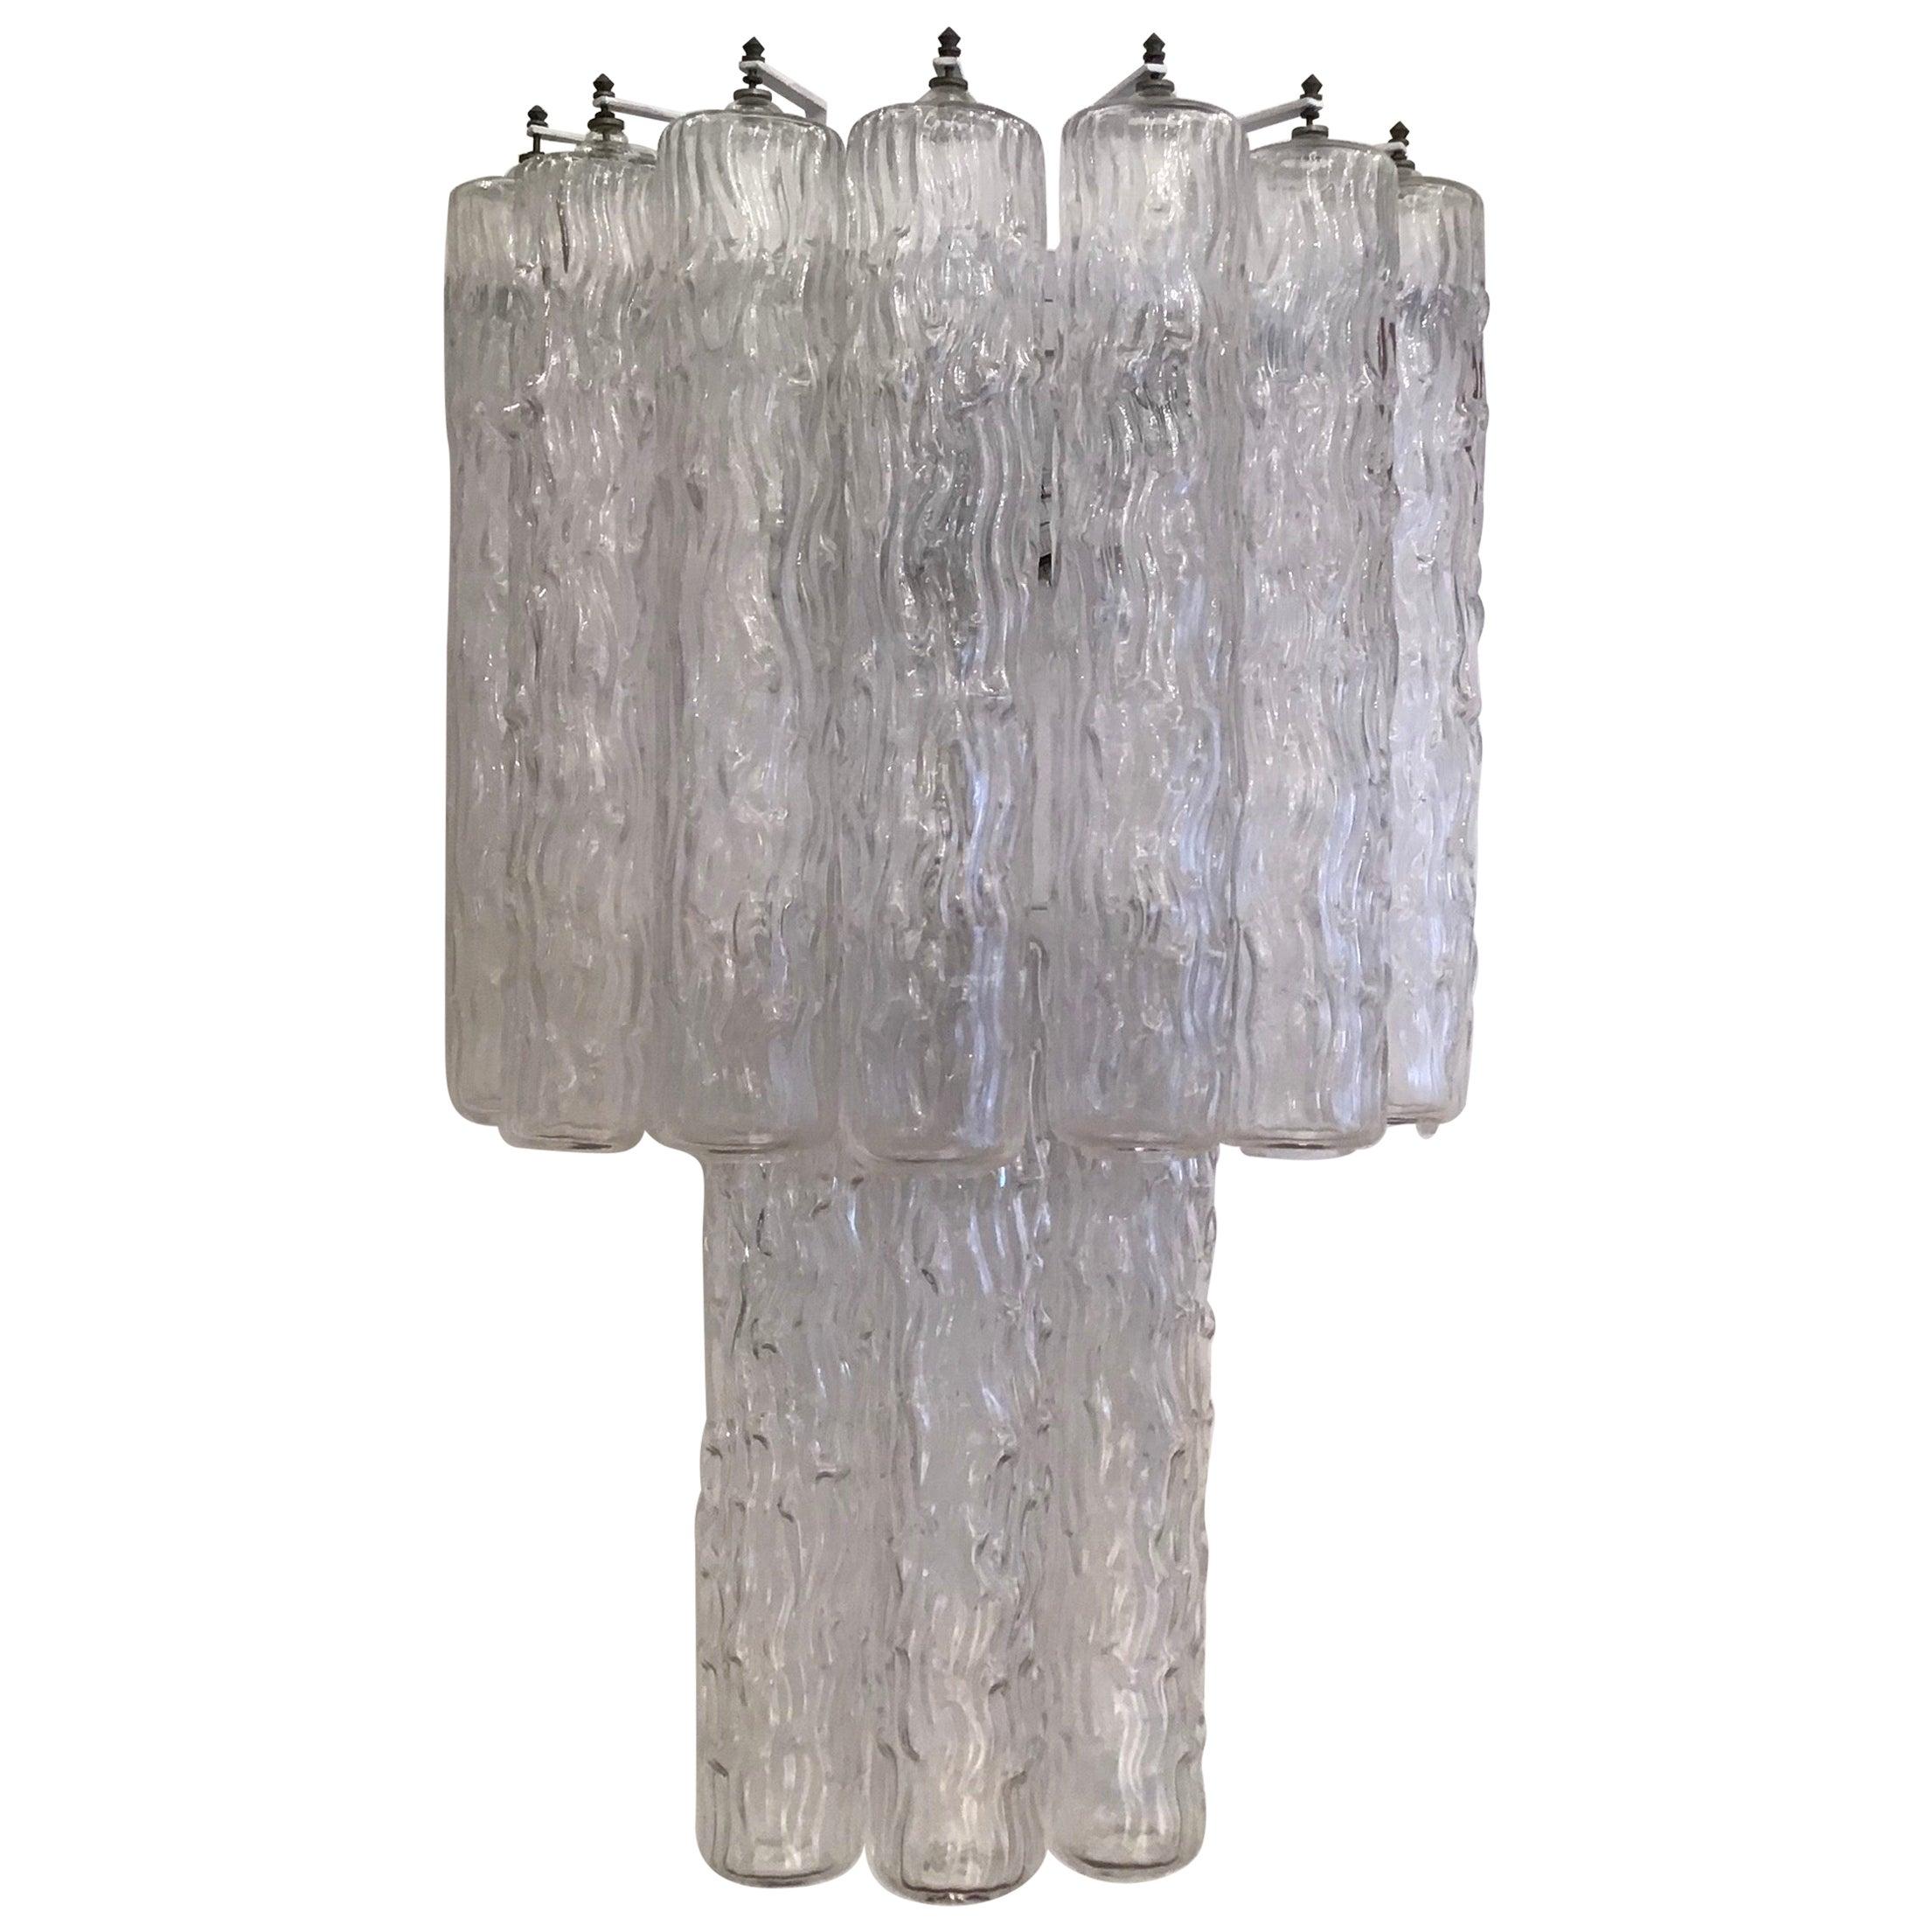 Venini Sconces Murano Glass Metal, 1955, Italy